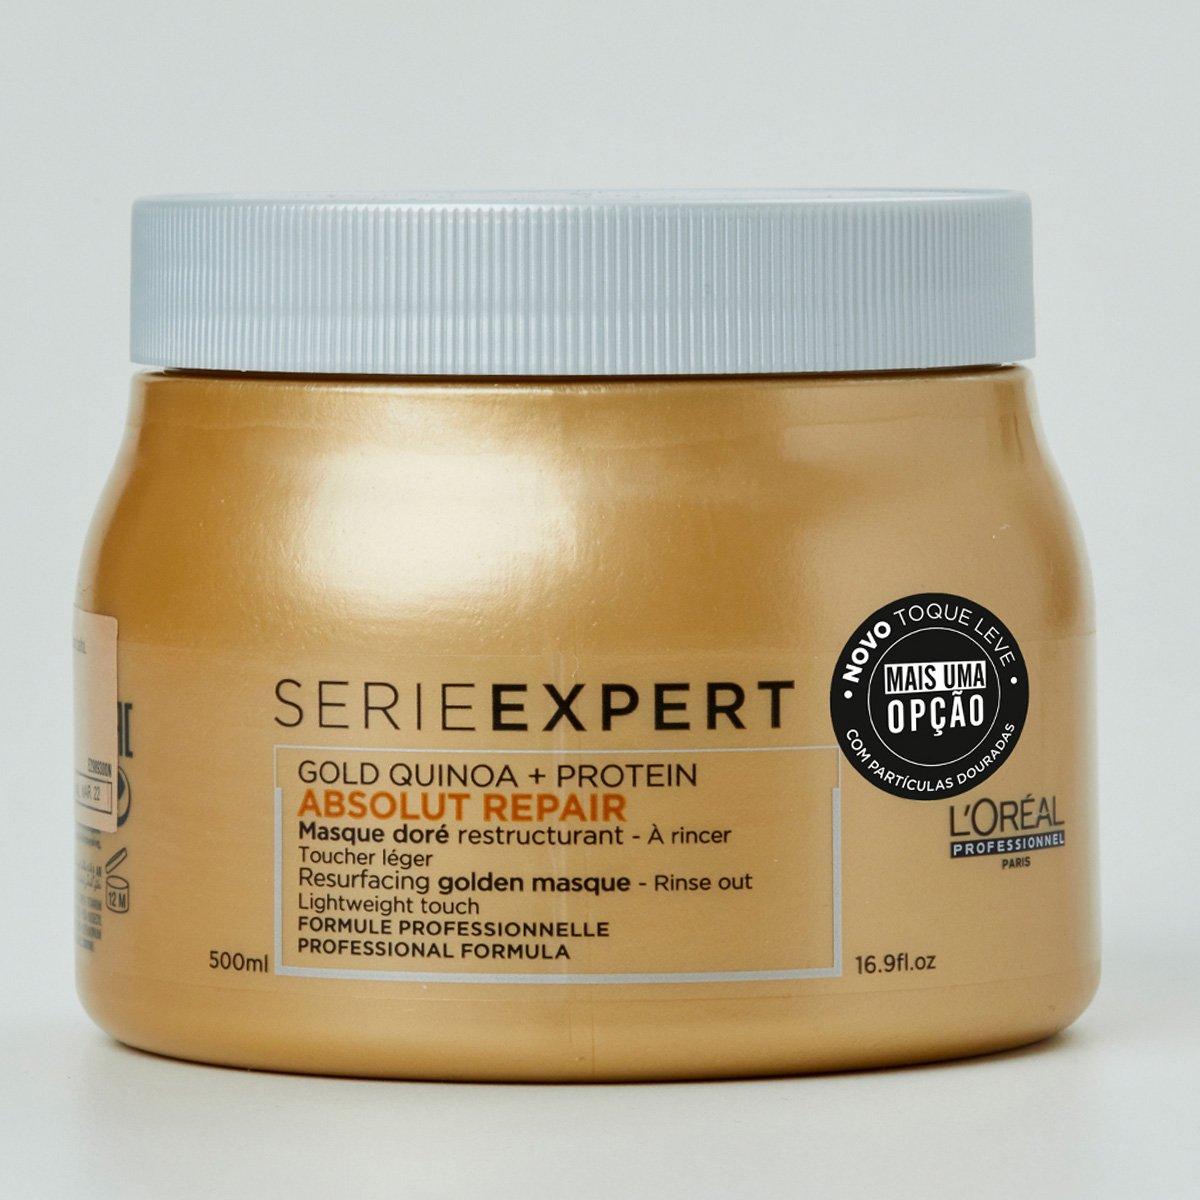 Máscara Light de Tratamento L'Oréal Professionnel Absolut Repair Gold Quinoa + Protein - 500ml